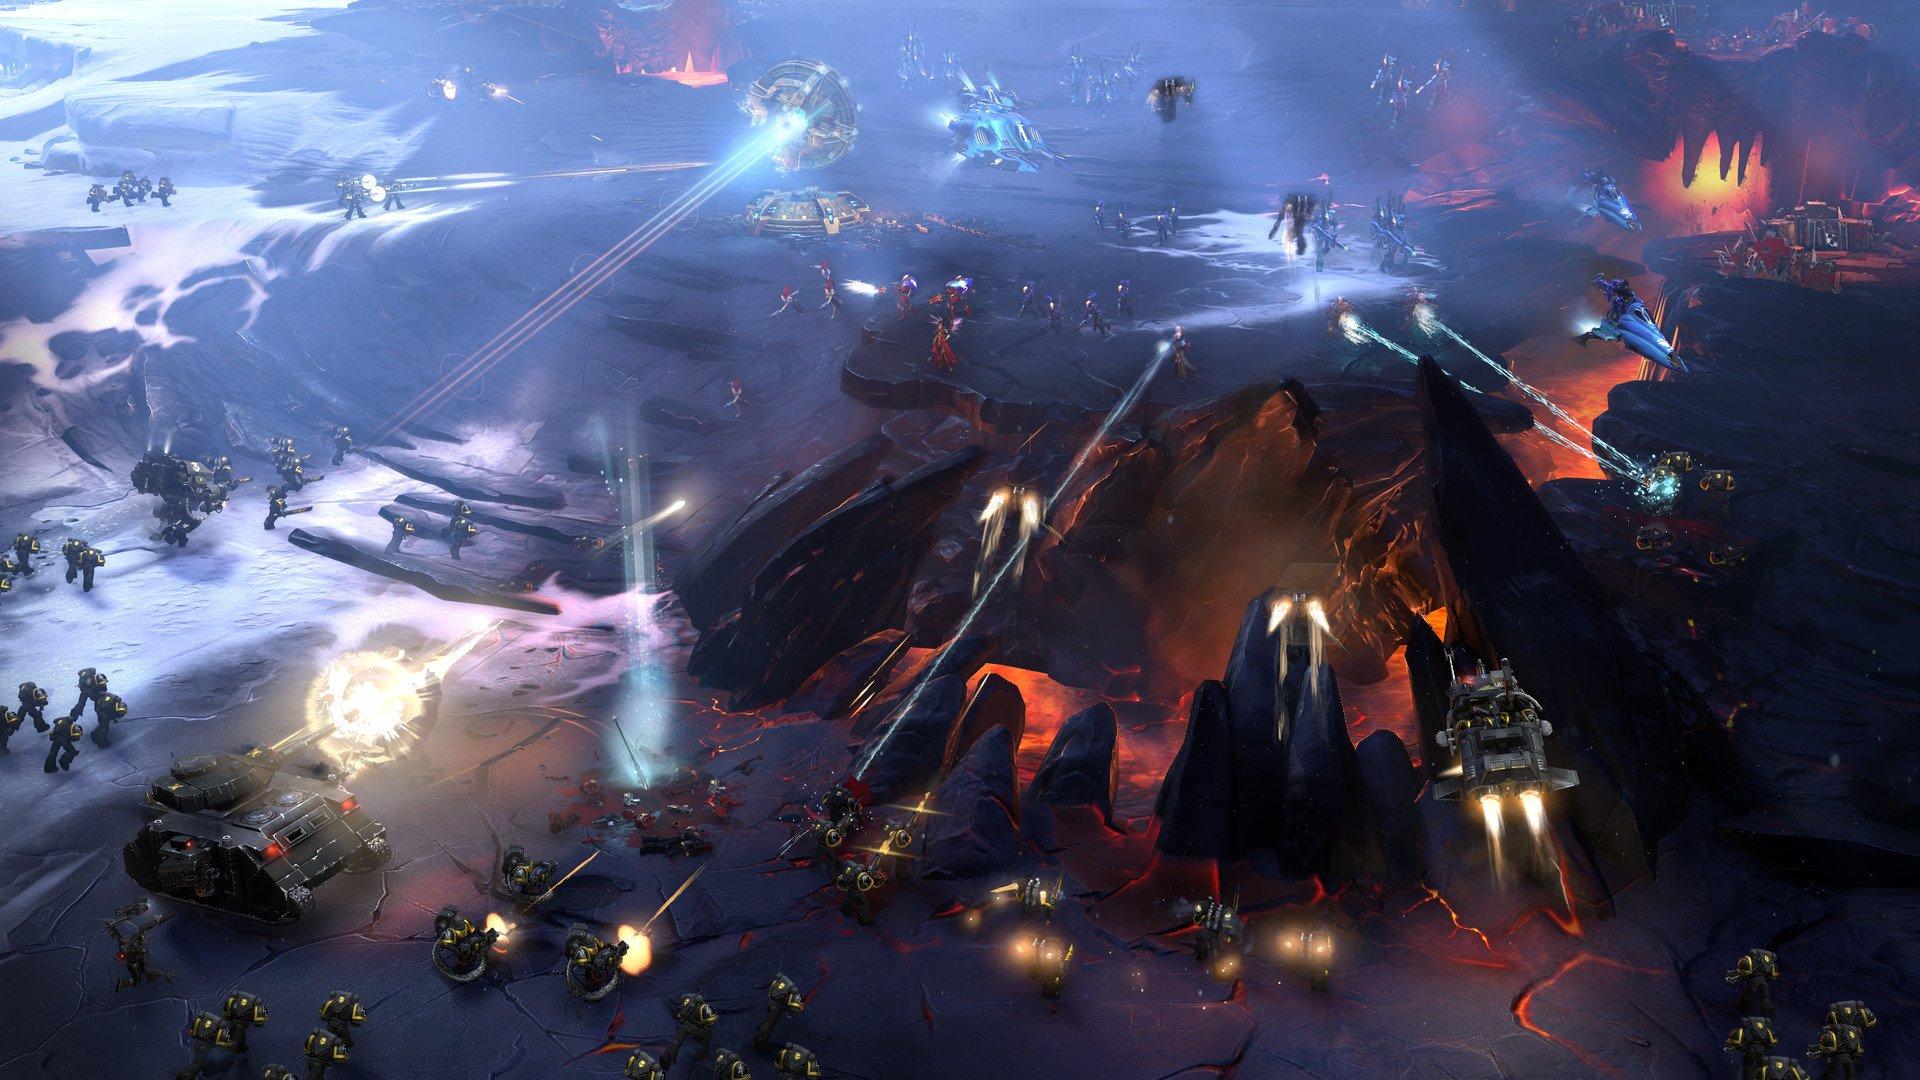 Warhammer 40,000: Dawn of War III game image